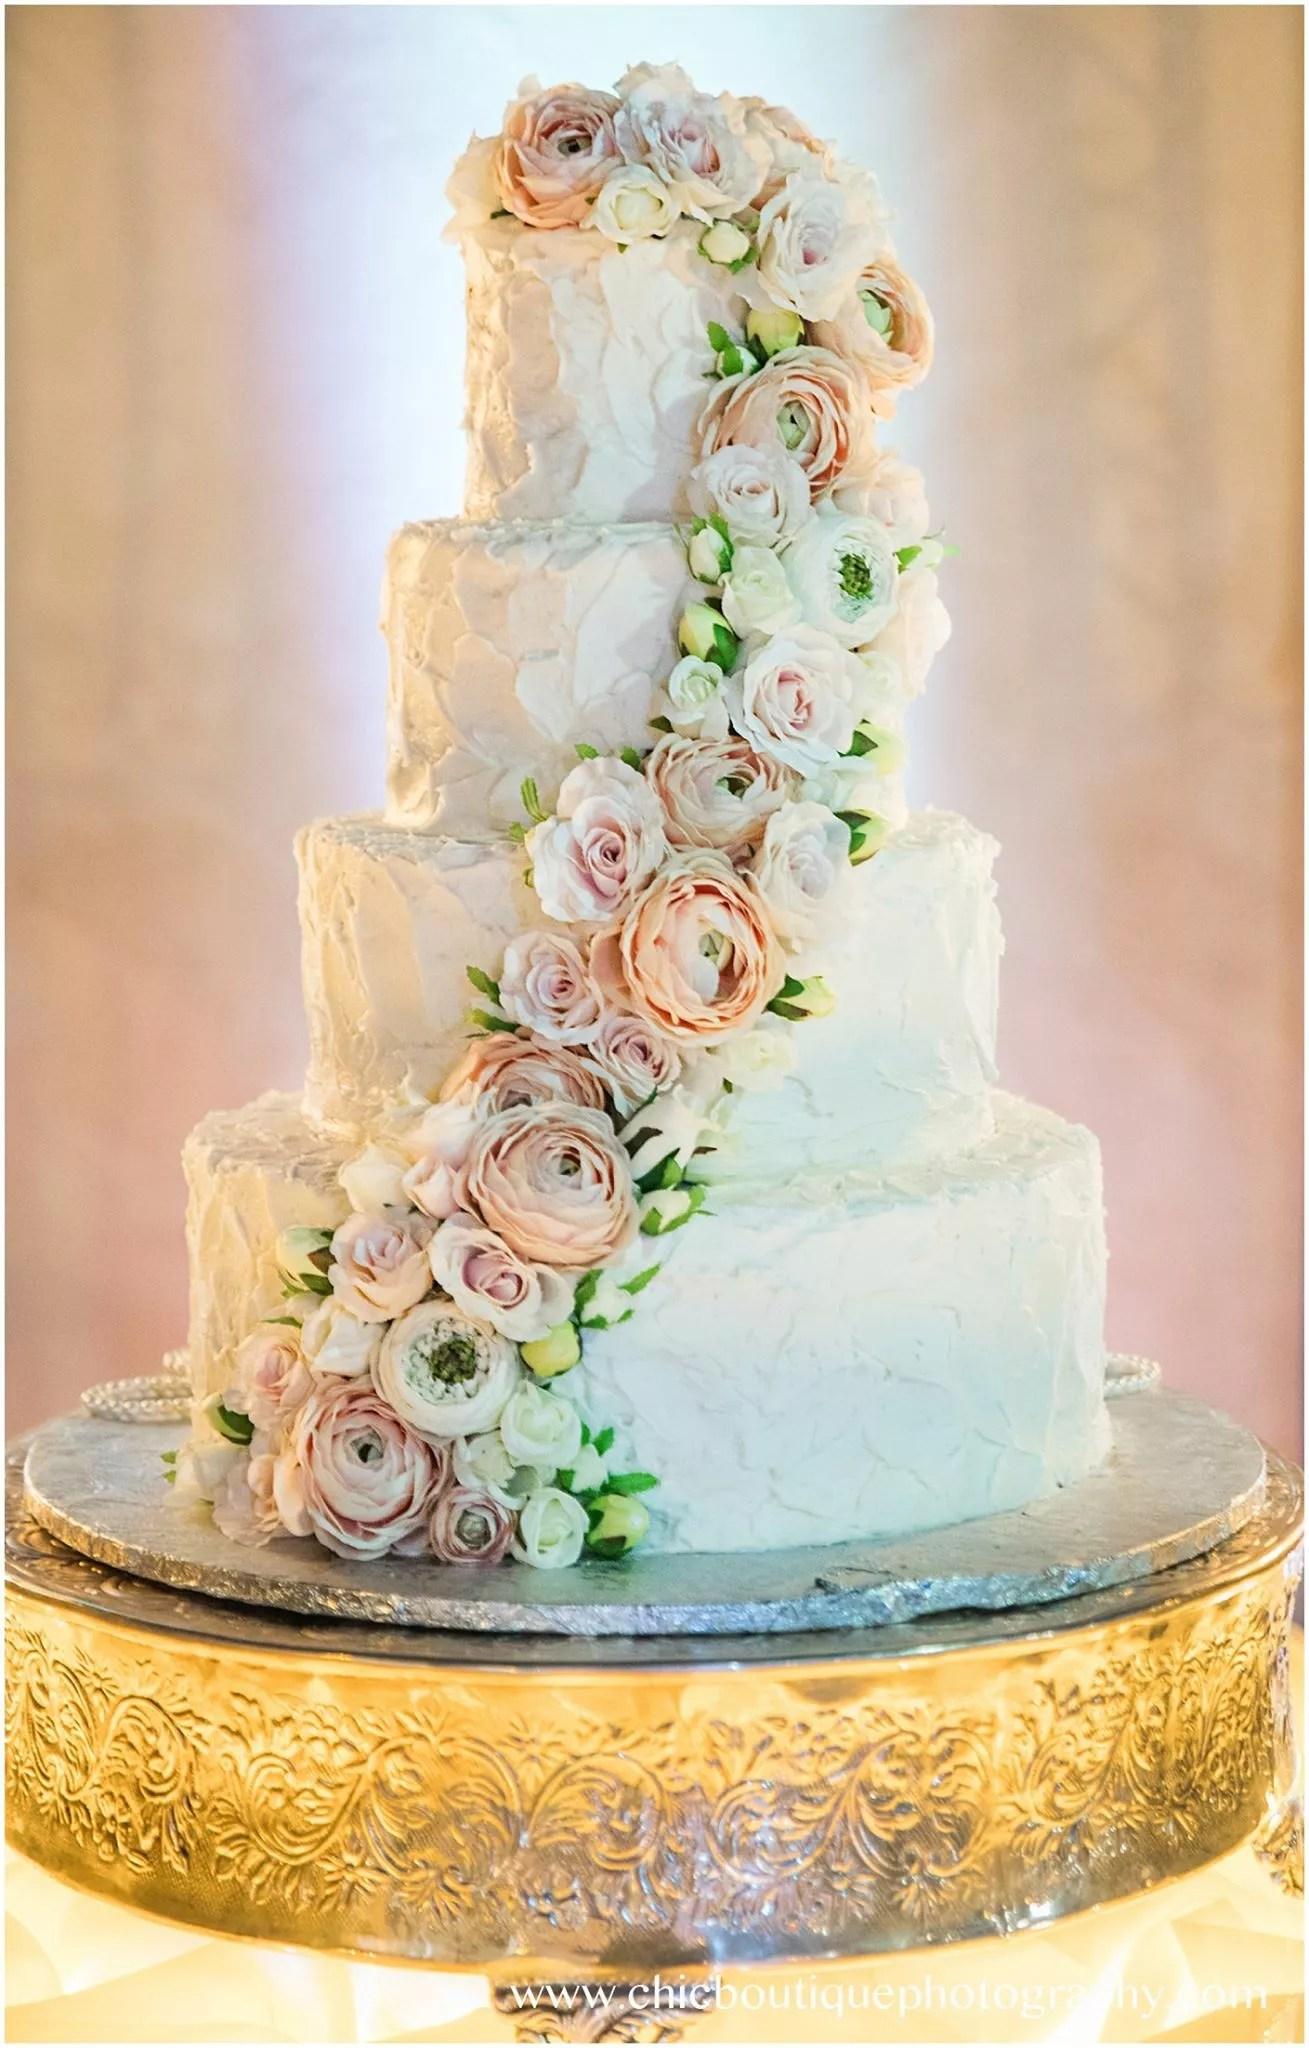 Joe Gambinos Bakery  Wedding Cakes  Metairie LA